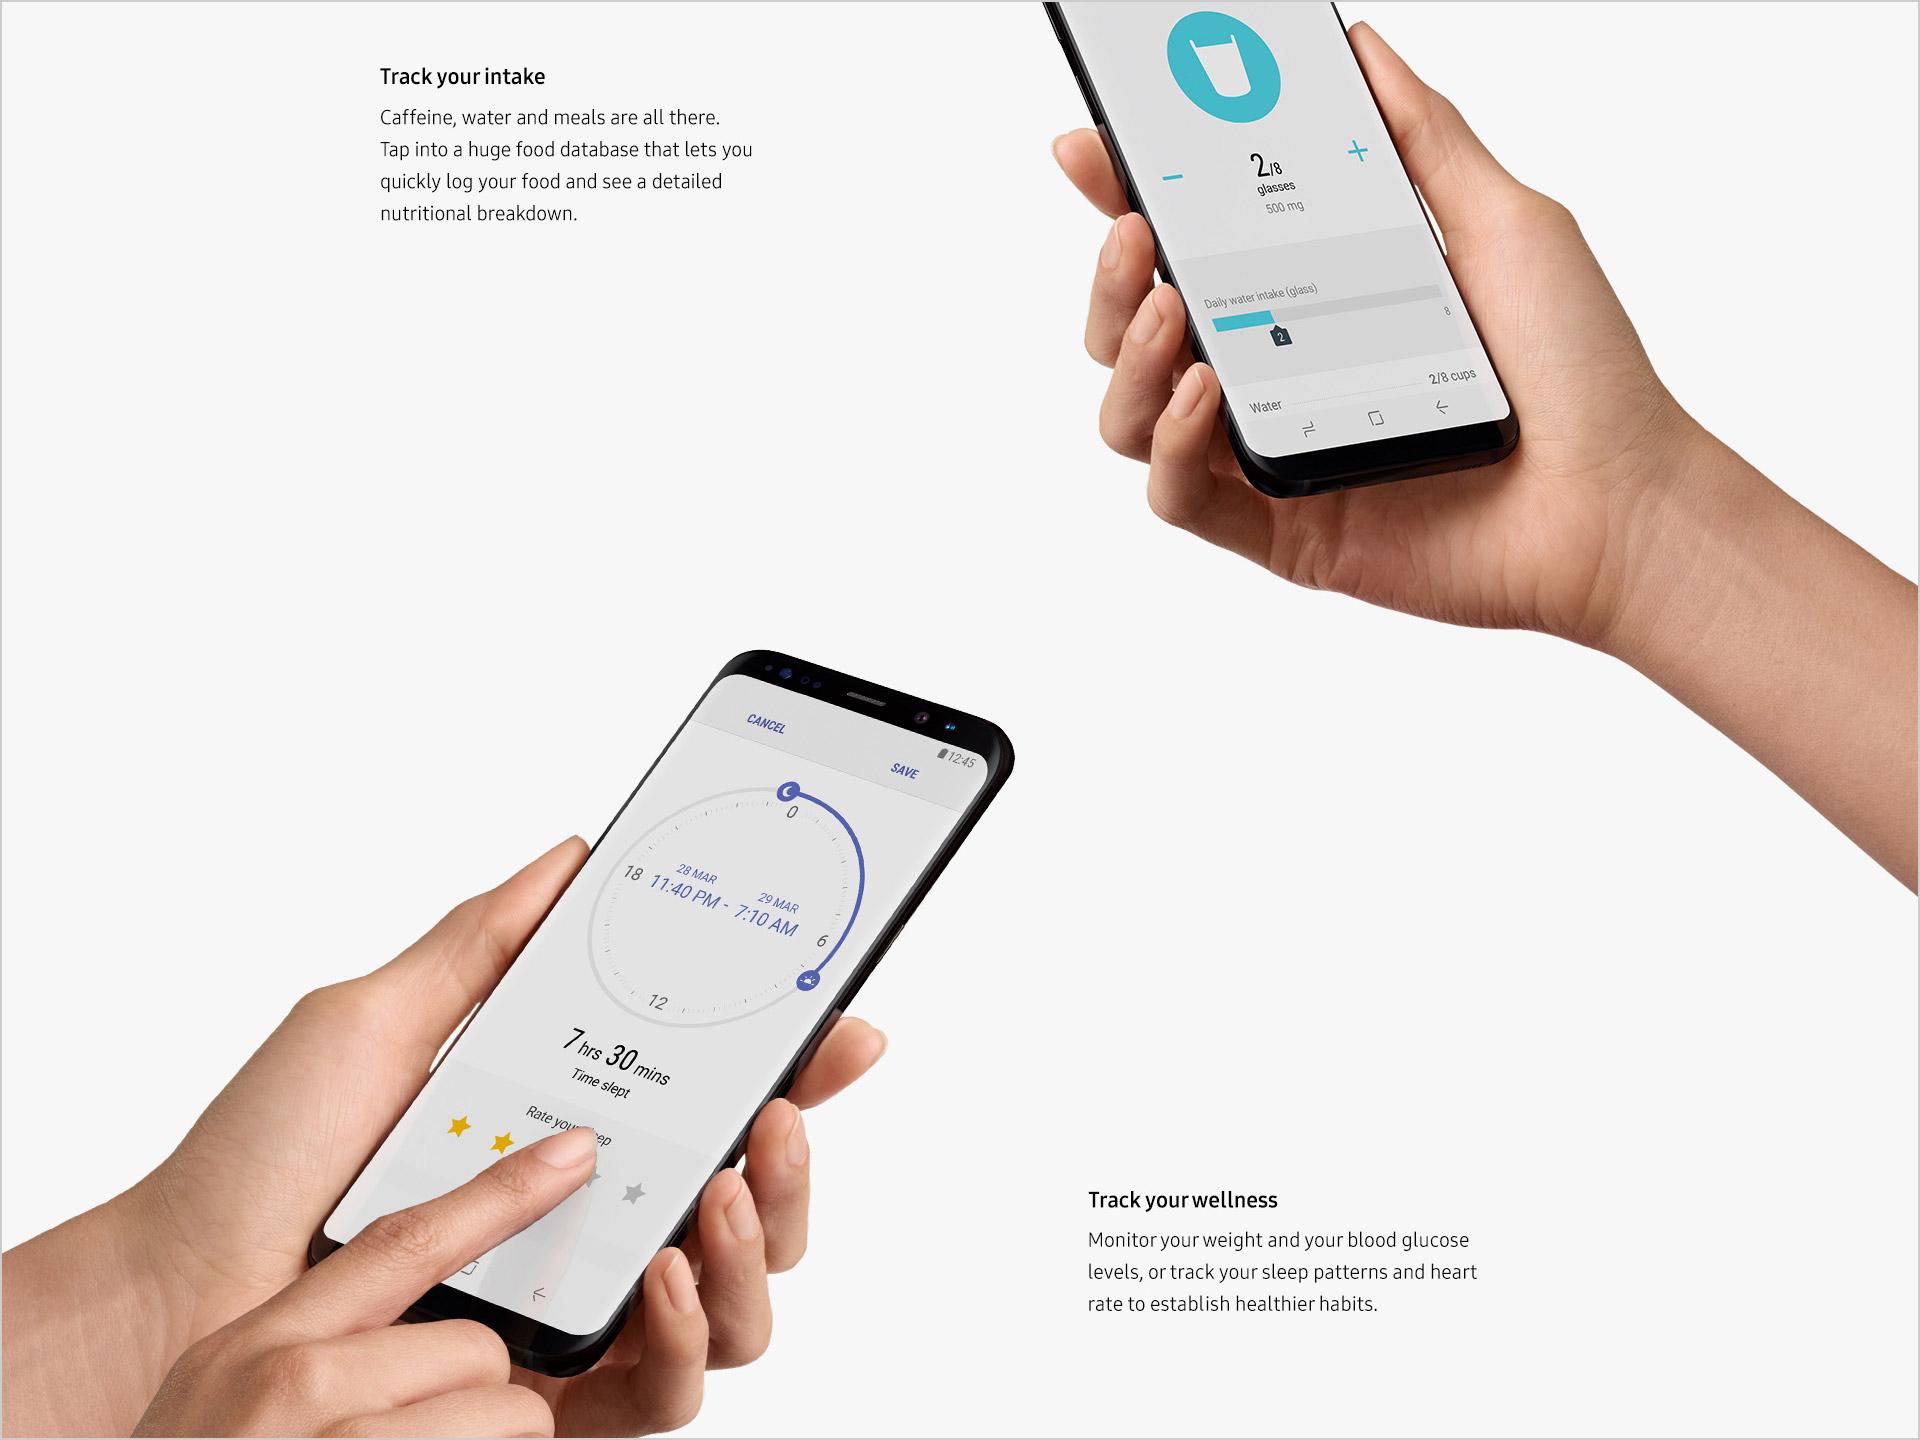 Samsung_Galaxy_S8_Web_Health_4.jpg